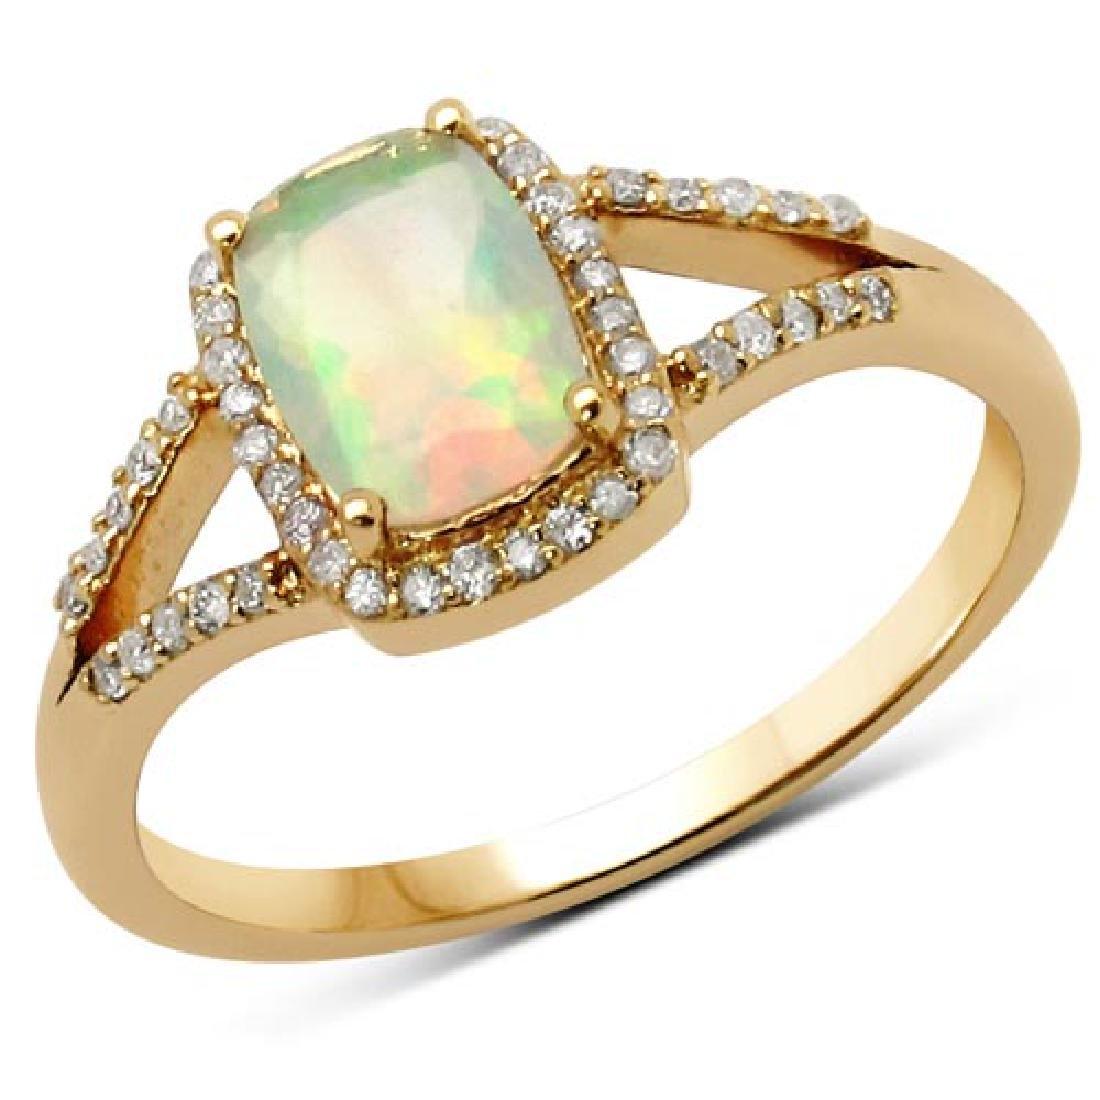 0.54 Carat Genuine Ethiopian Opal and White Diamond 14K